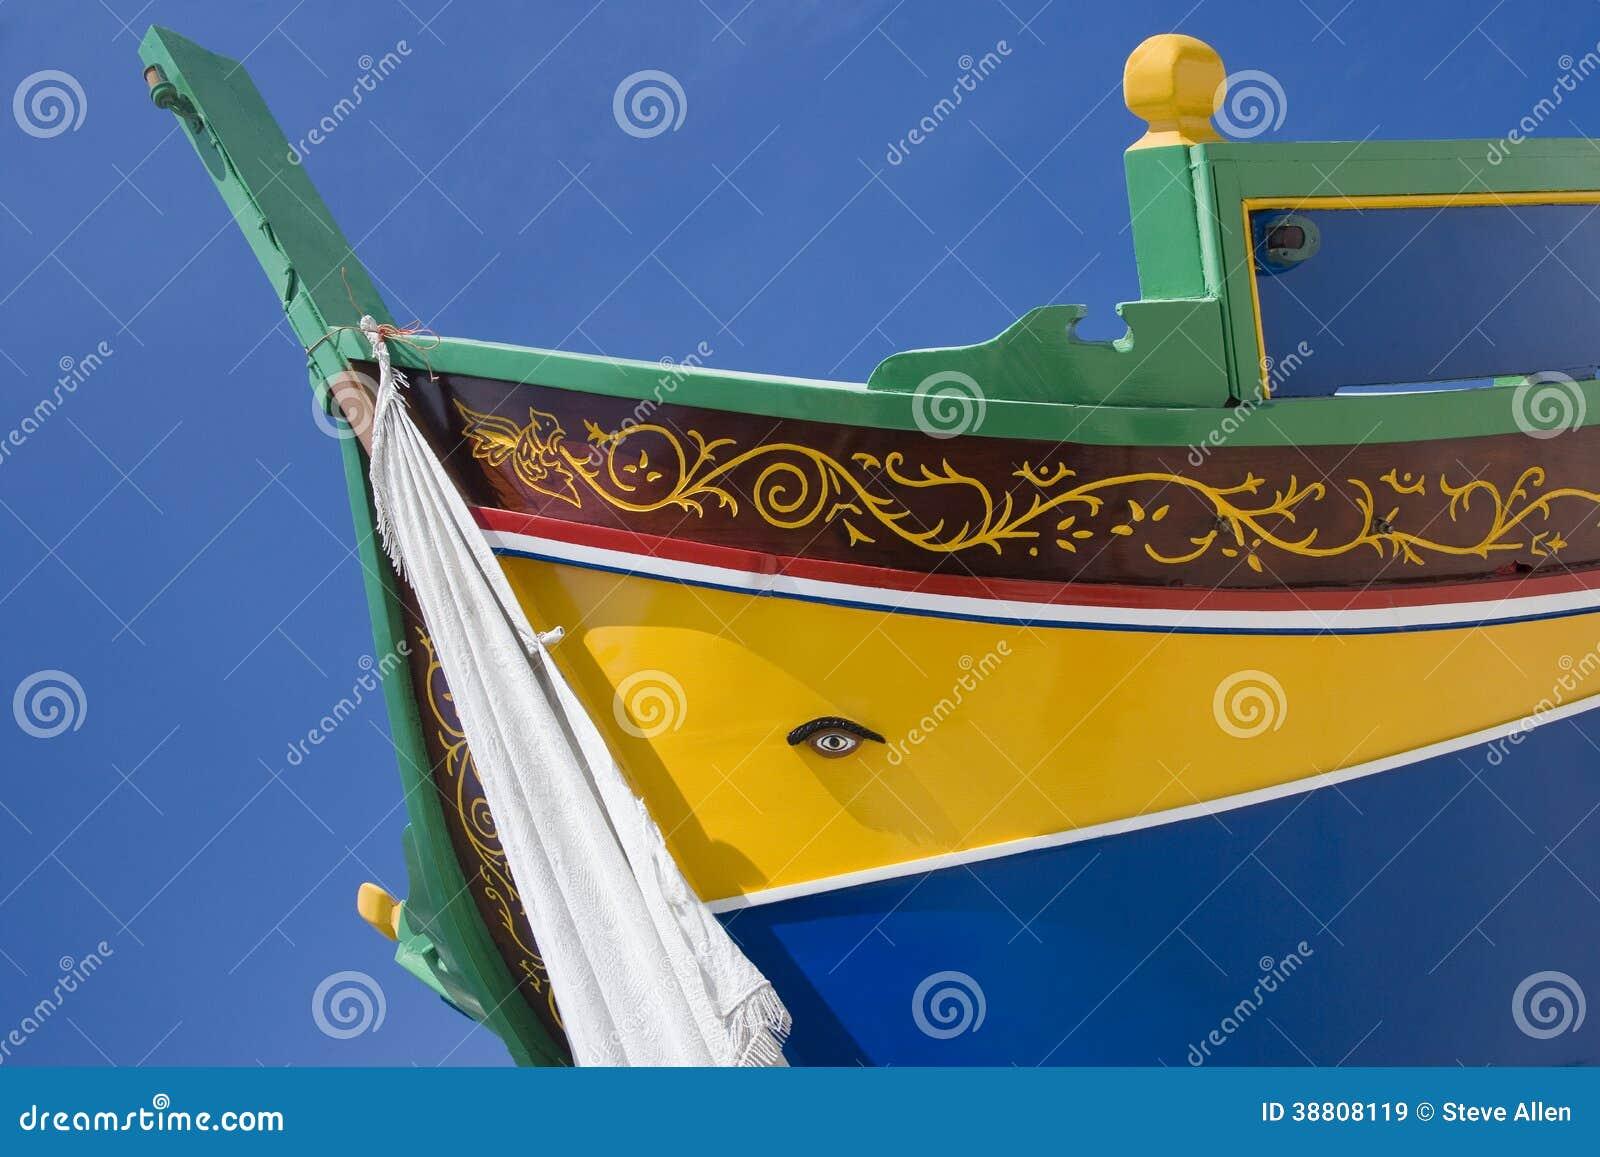 Traditional fishing boat plans | David Chan